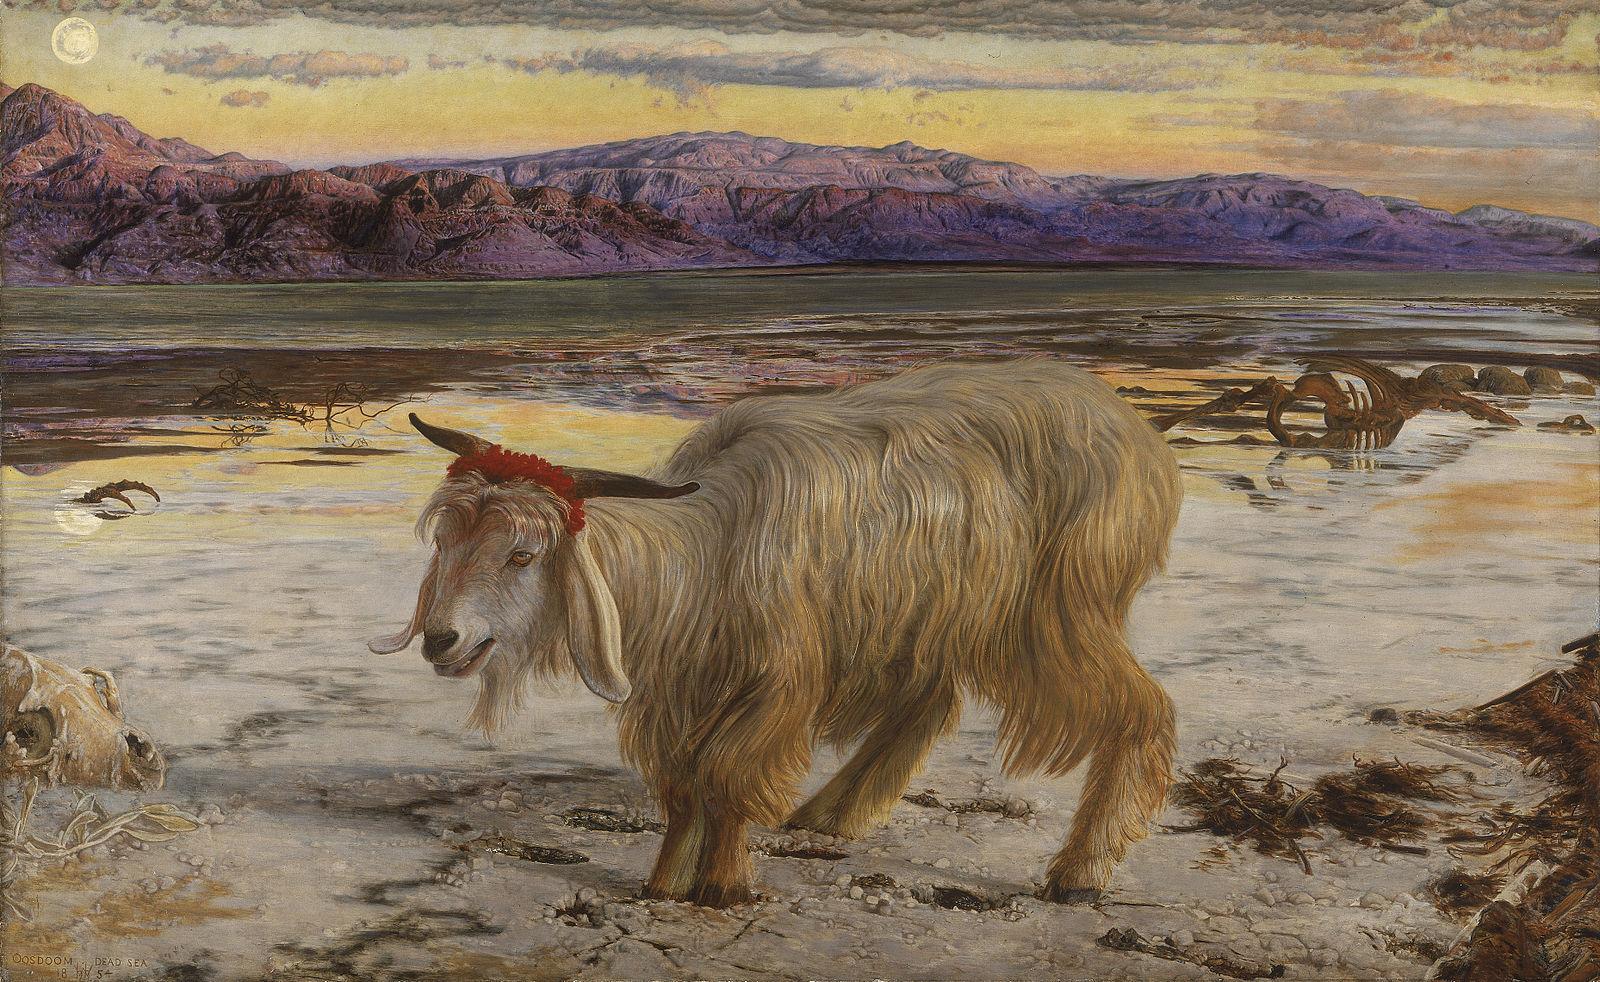 William Holman Hunt [Public domain], via Wikimedia Commons